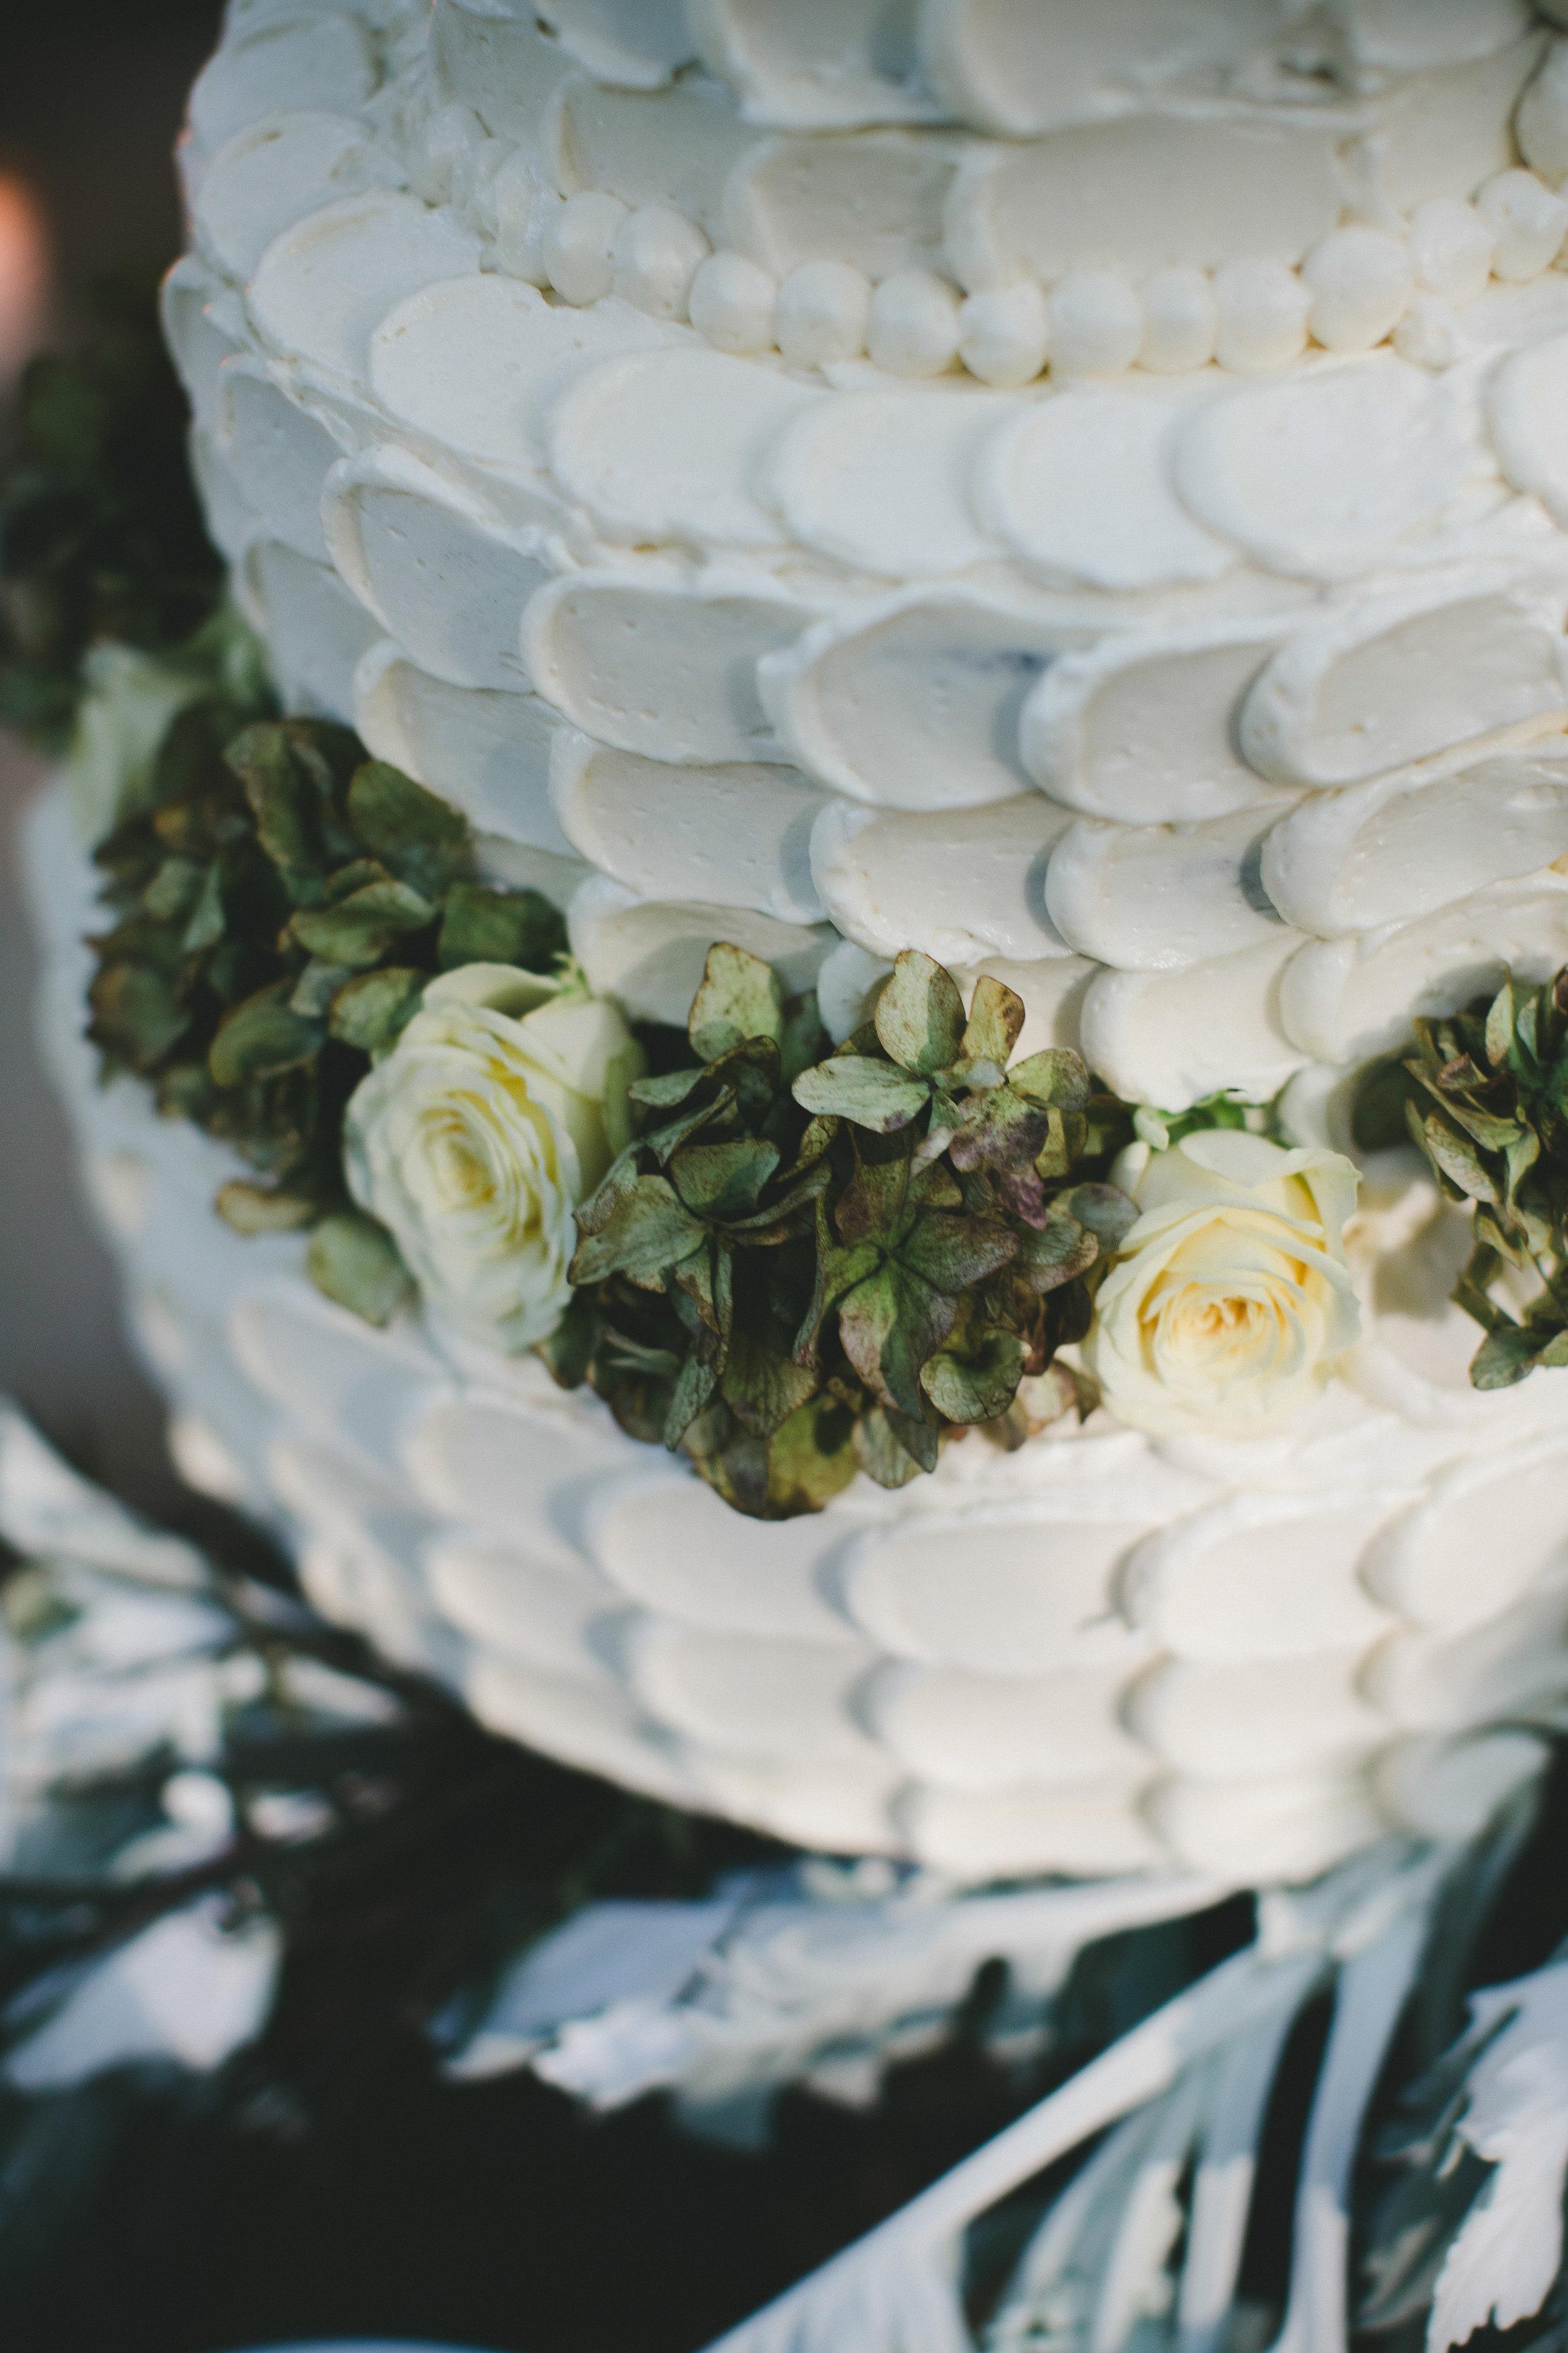 Wedding_Cake_Buttercream_Frosting_Dessert_Fiend.jpg